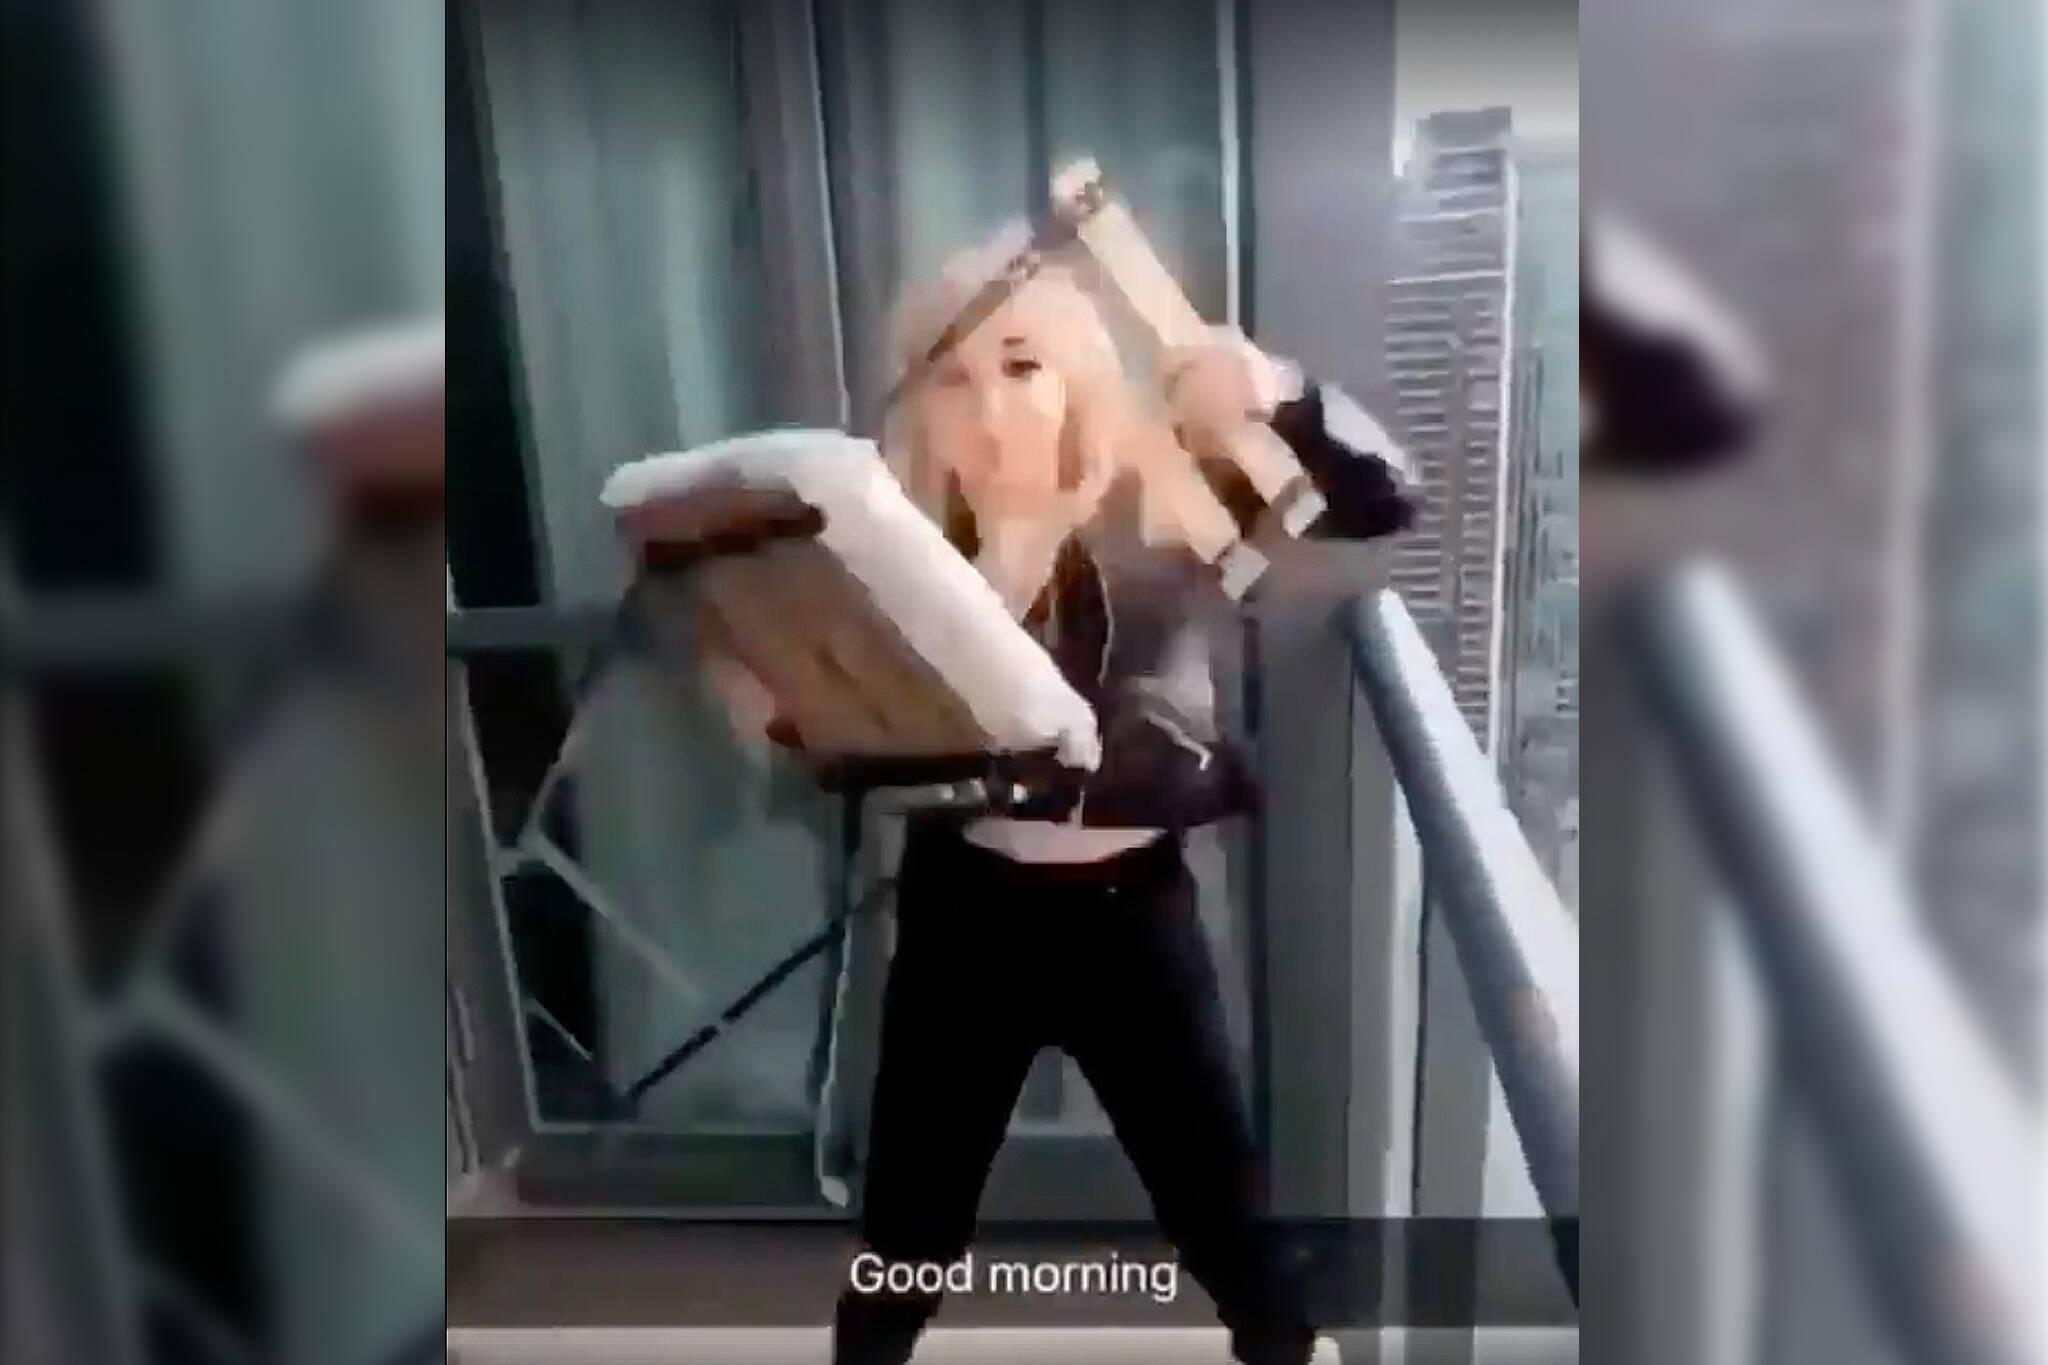 Toronto Police Identify Woman Who Threw Chair From Balcony